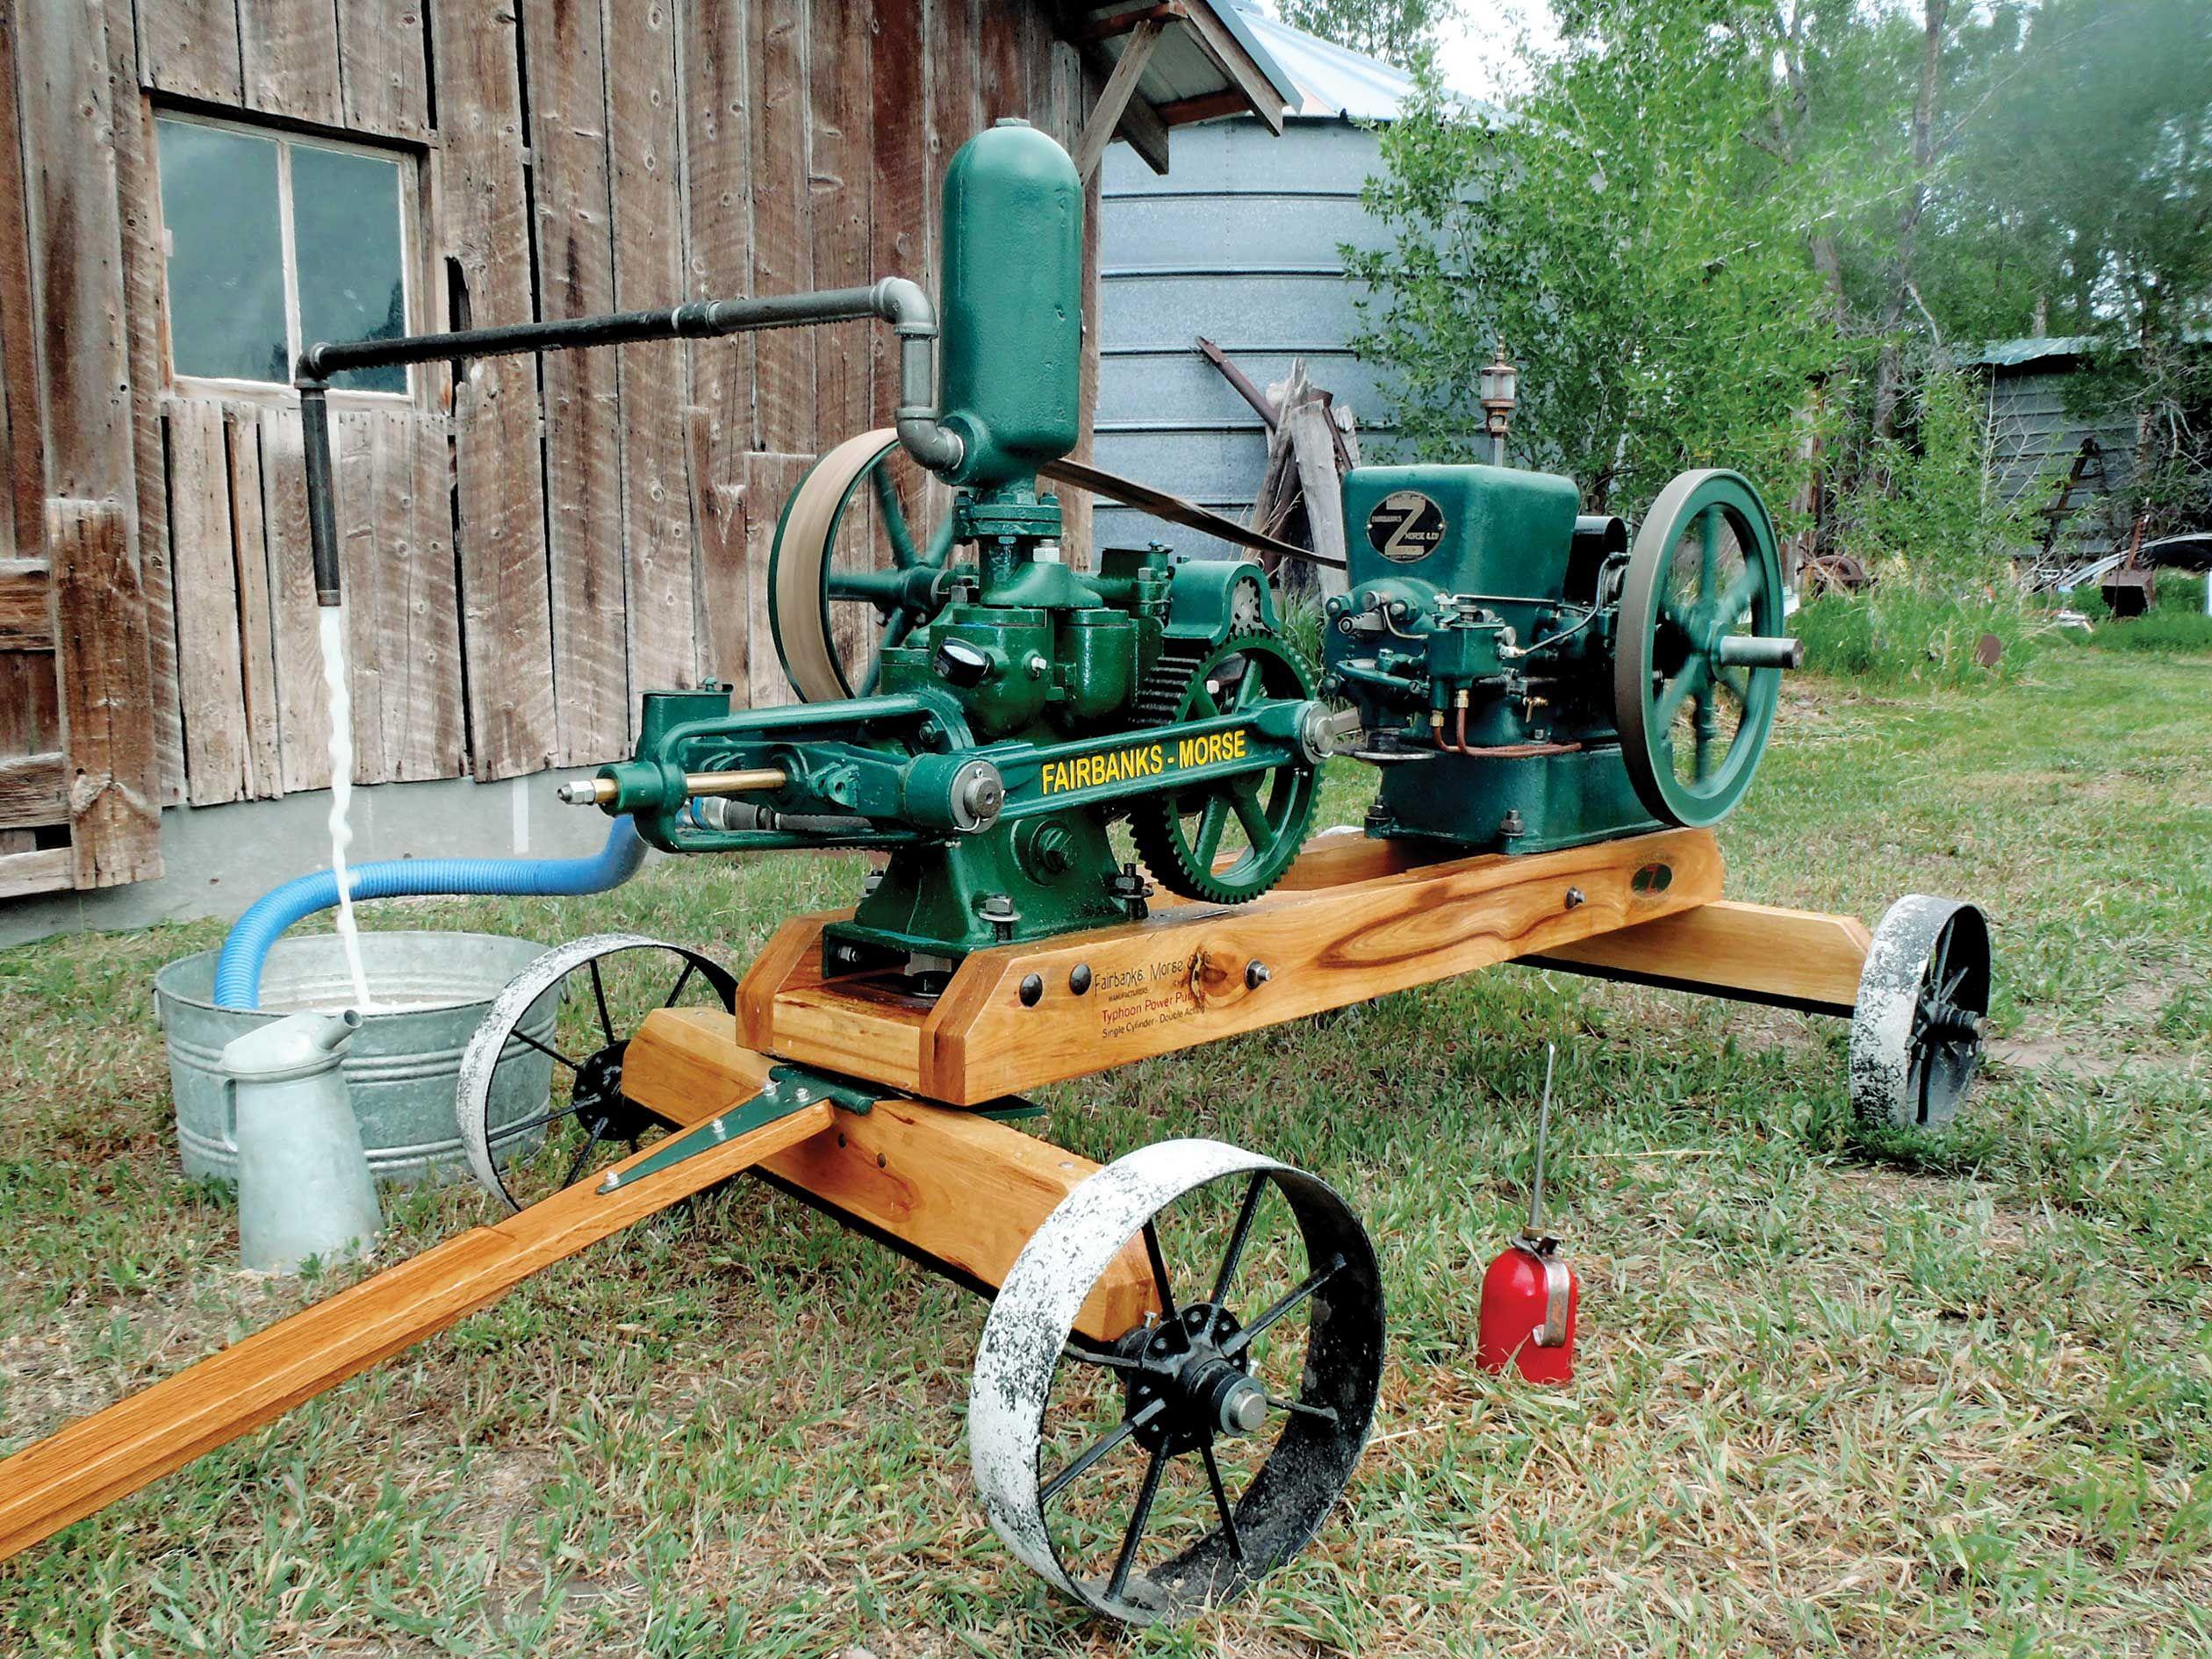 FairbanksMorse Z Farm Team Resurrection Restoration